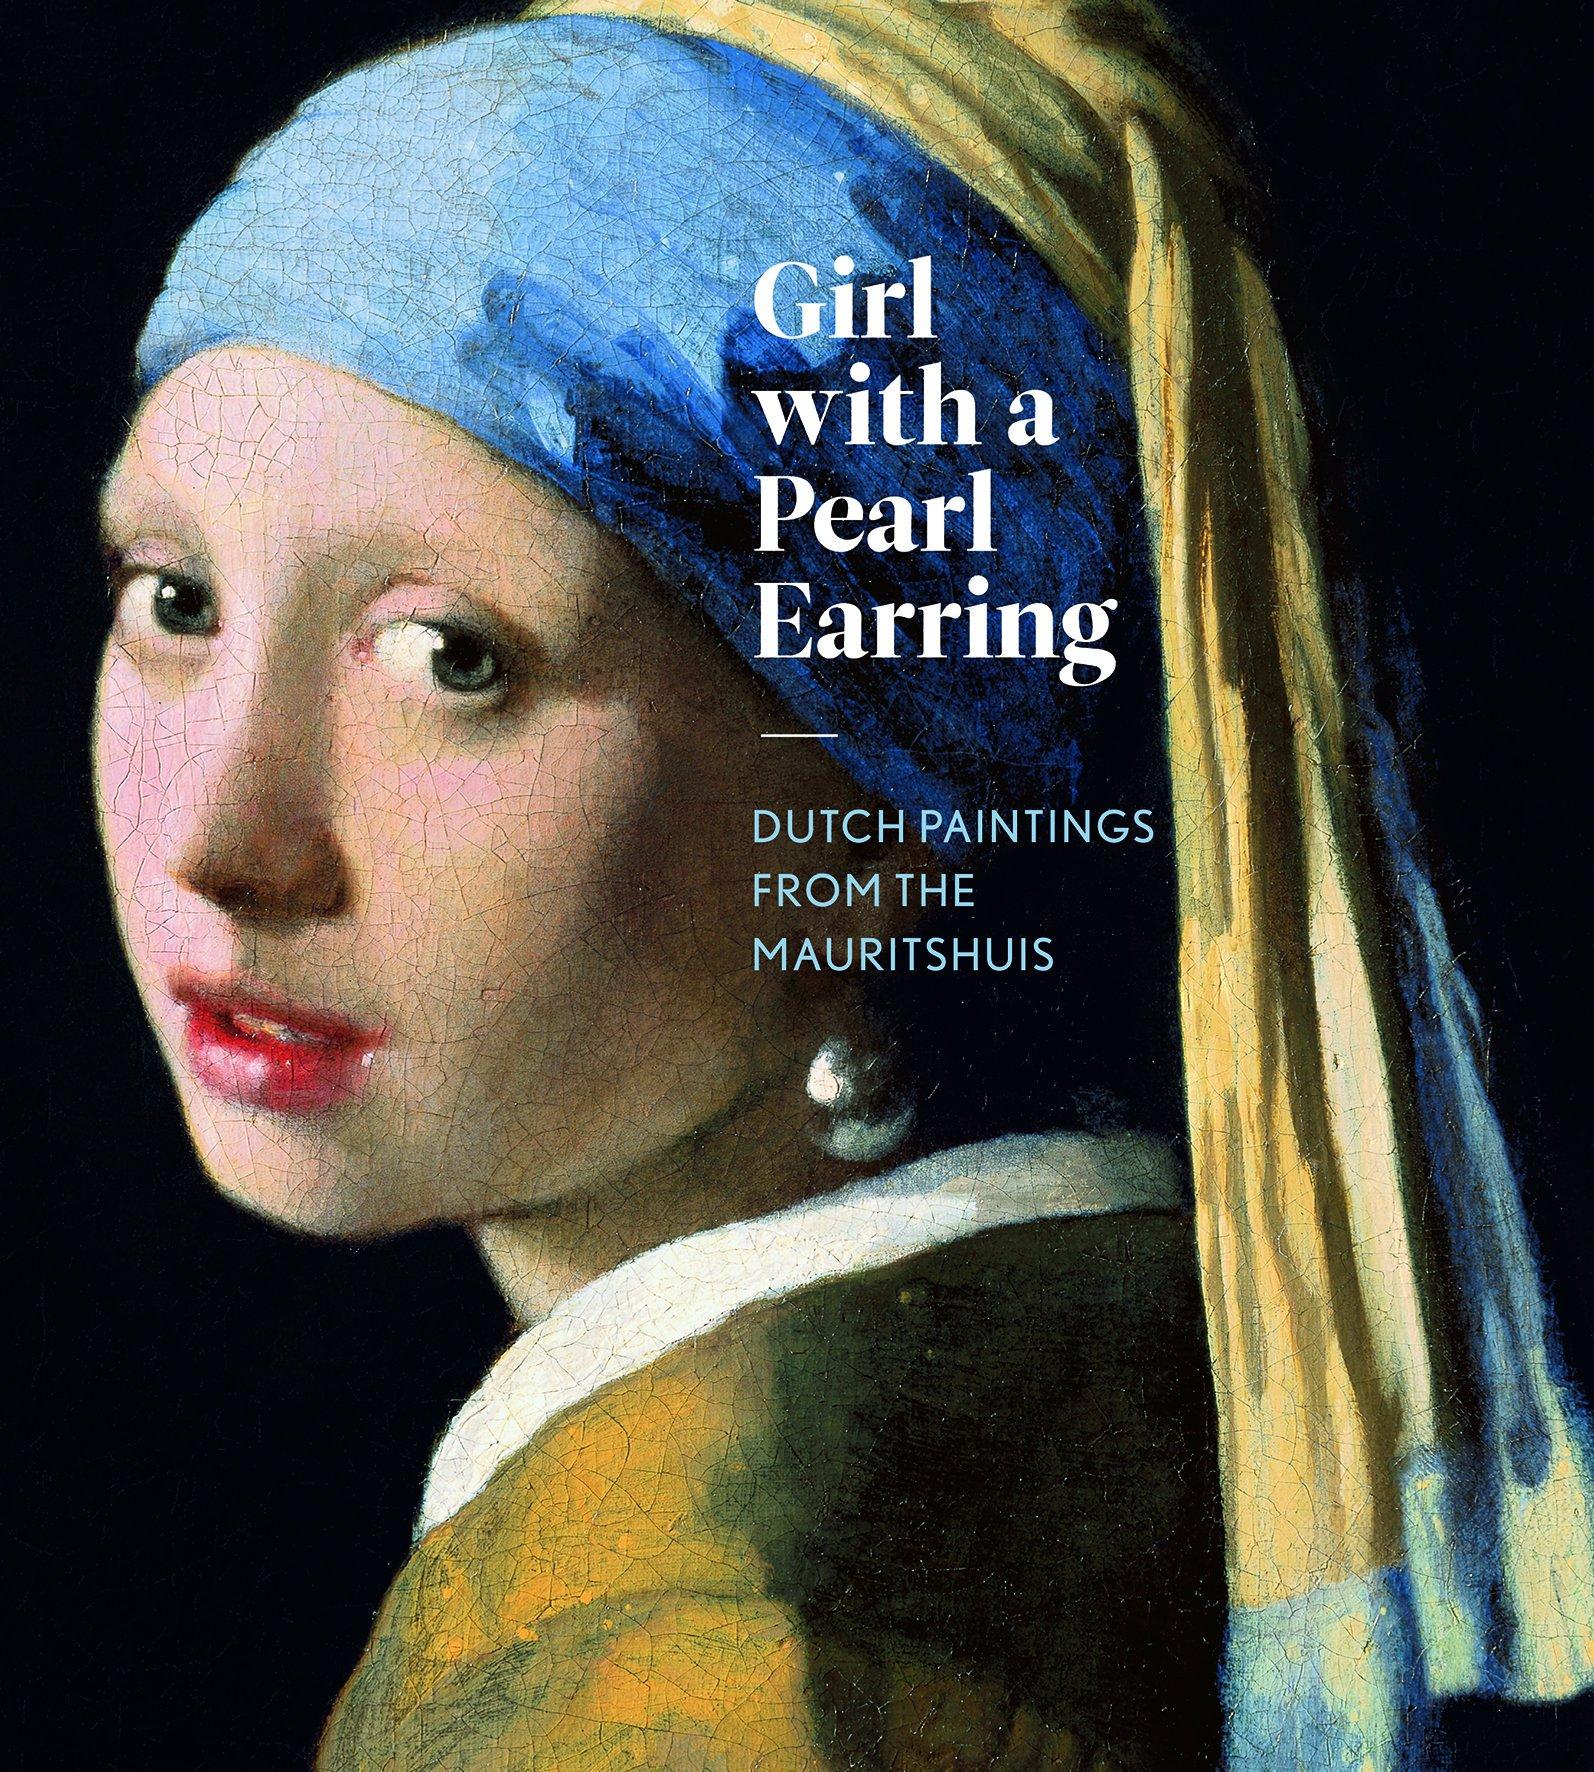 Girl With A Pearl Earring: Dutch Paintings From The Mauritshuis: Lea Van  Der Vinde, Quentin Buvelot, Emilie Gordenker, Petria Noble, Lynn Federle  Orr: